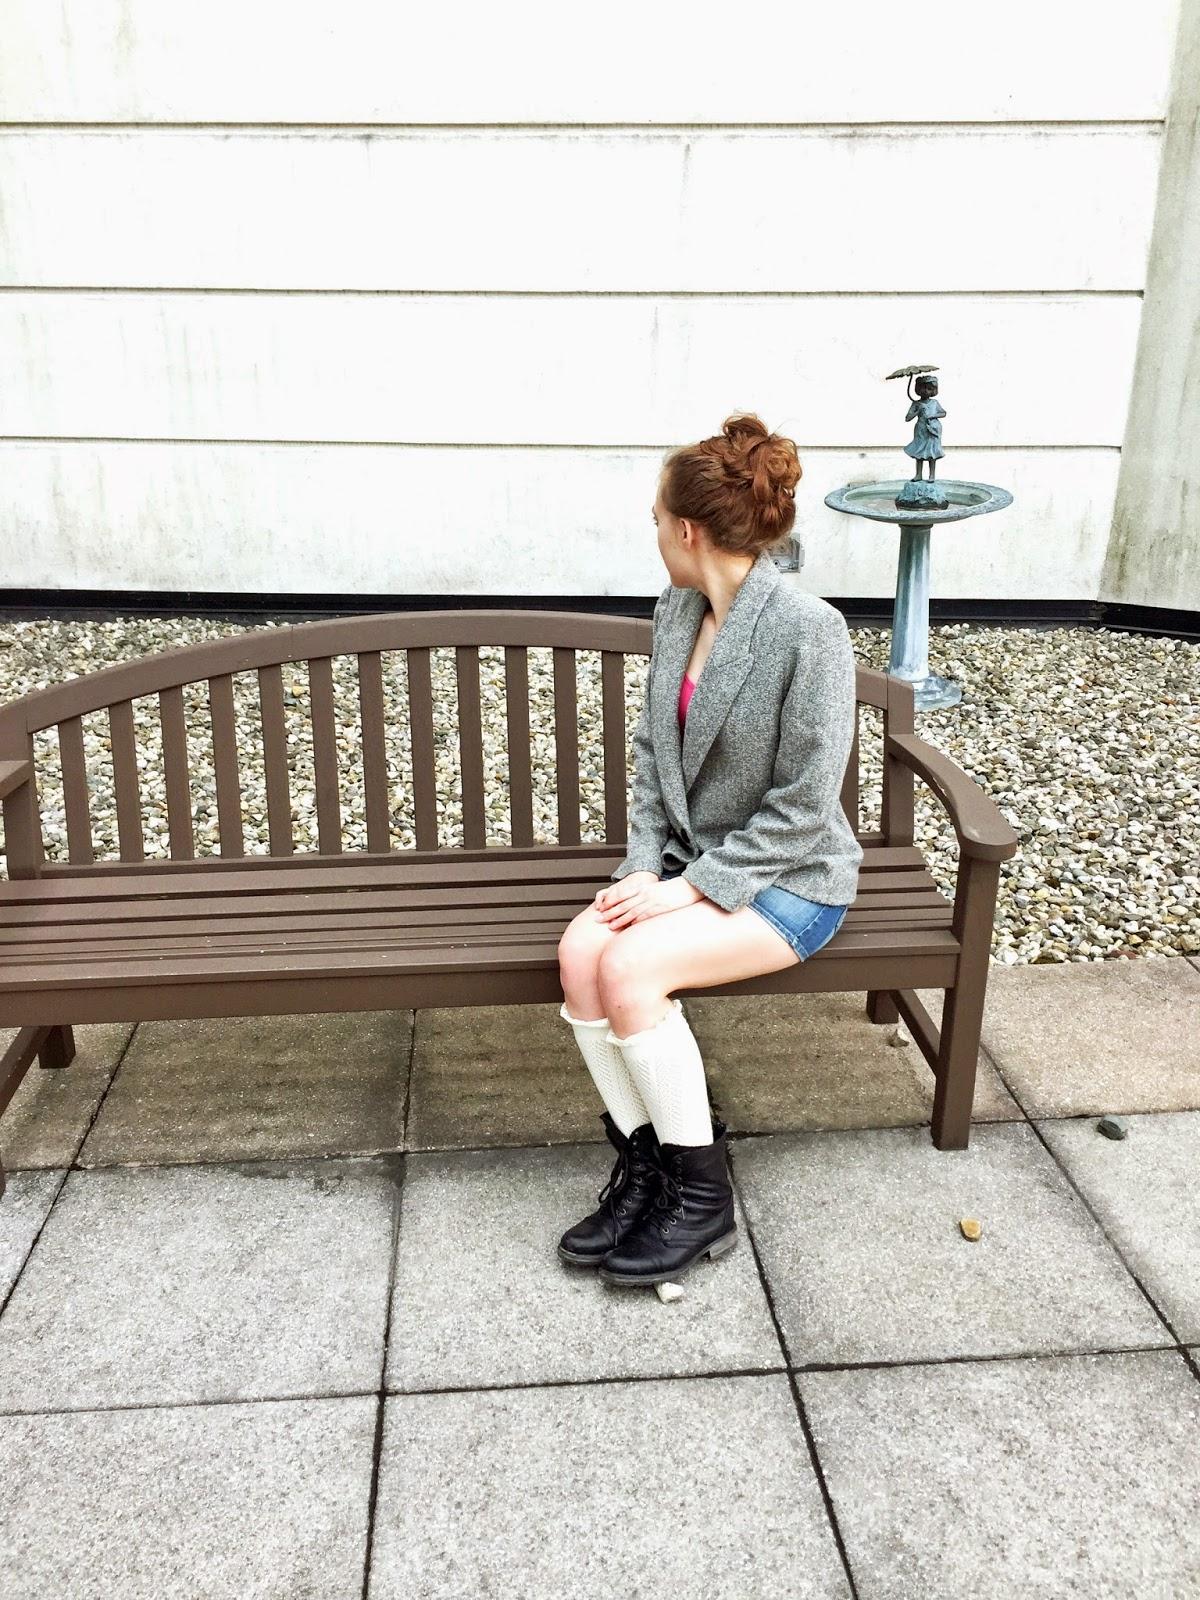 mini-skirt-combat-boots-lace-stockings